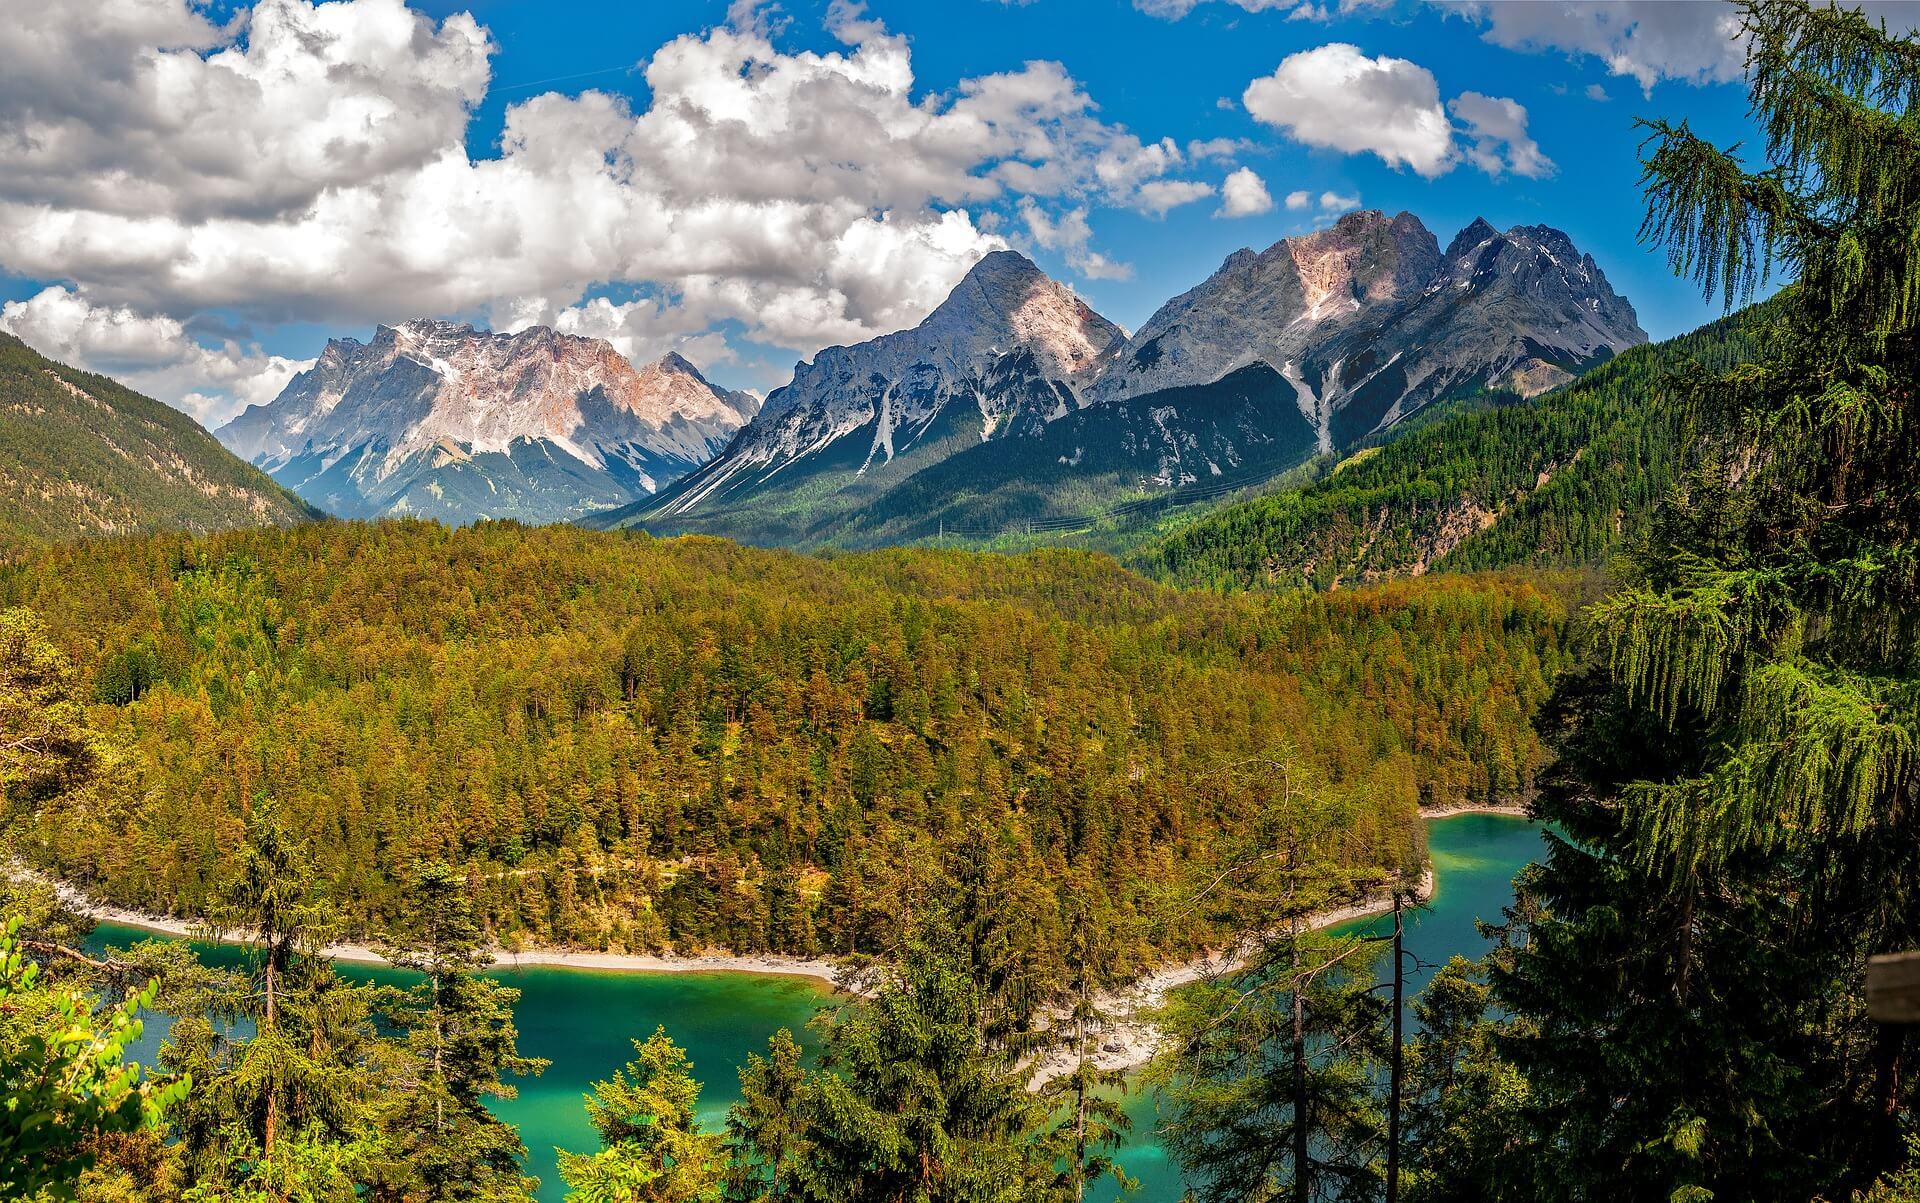 Paysages Alpes Roadtrip en Van